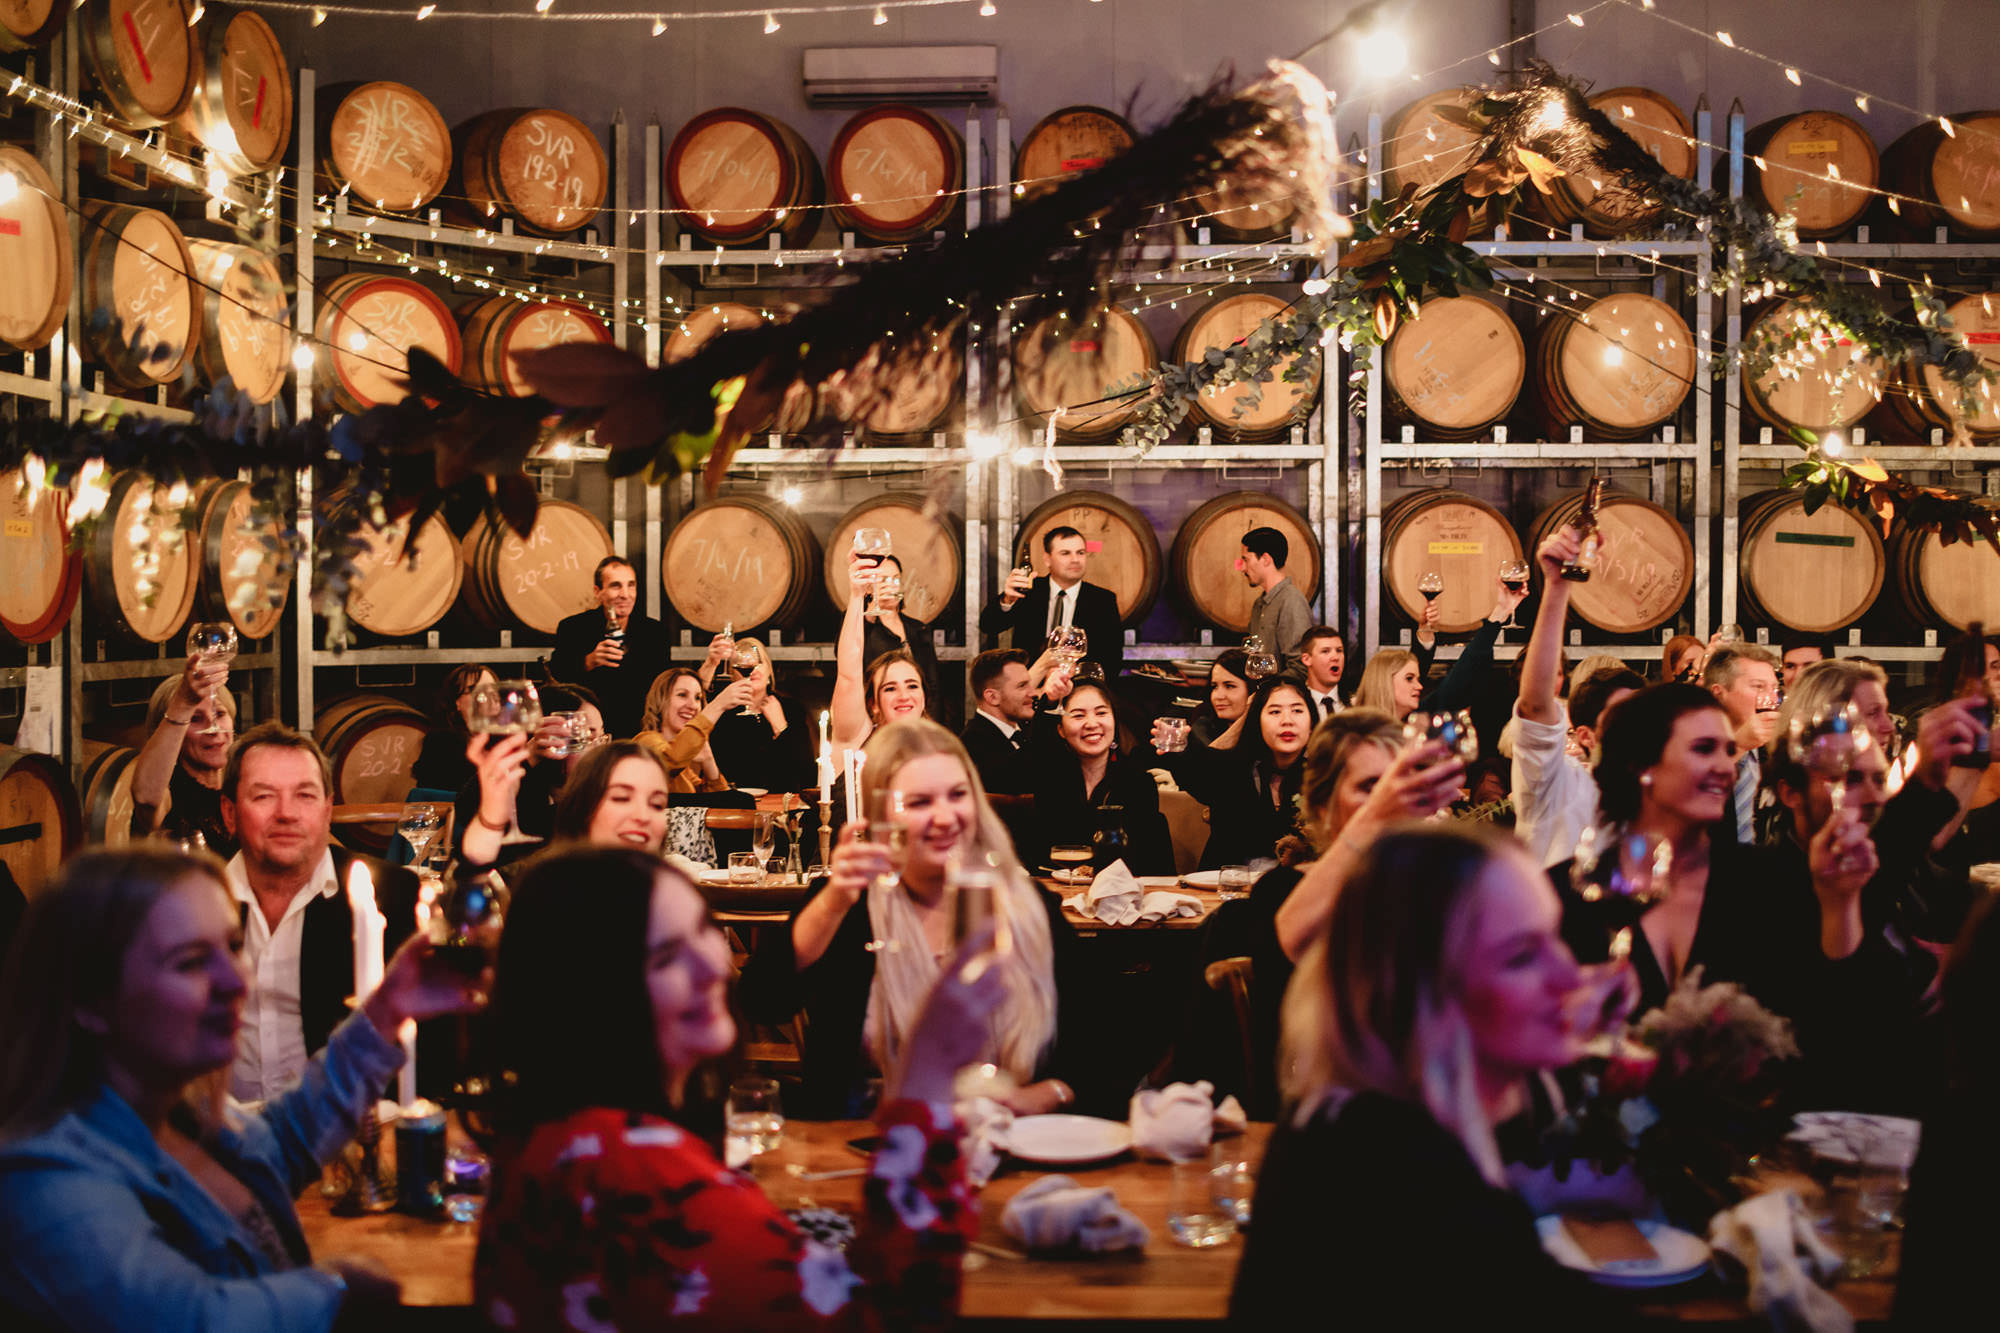 piggs peake winery wedding